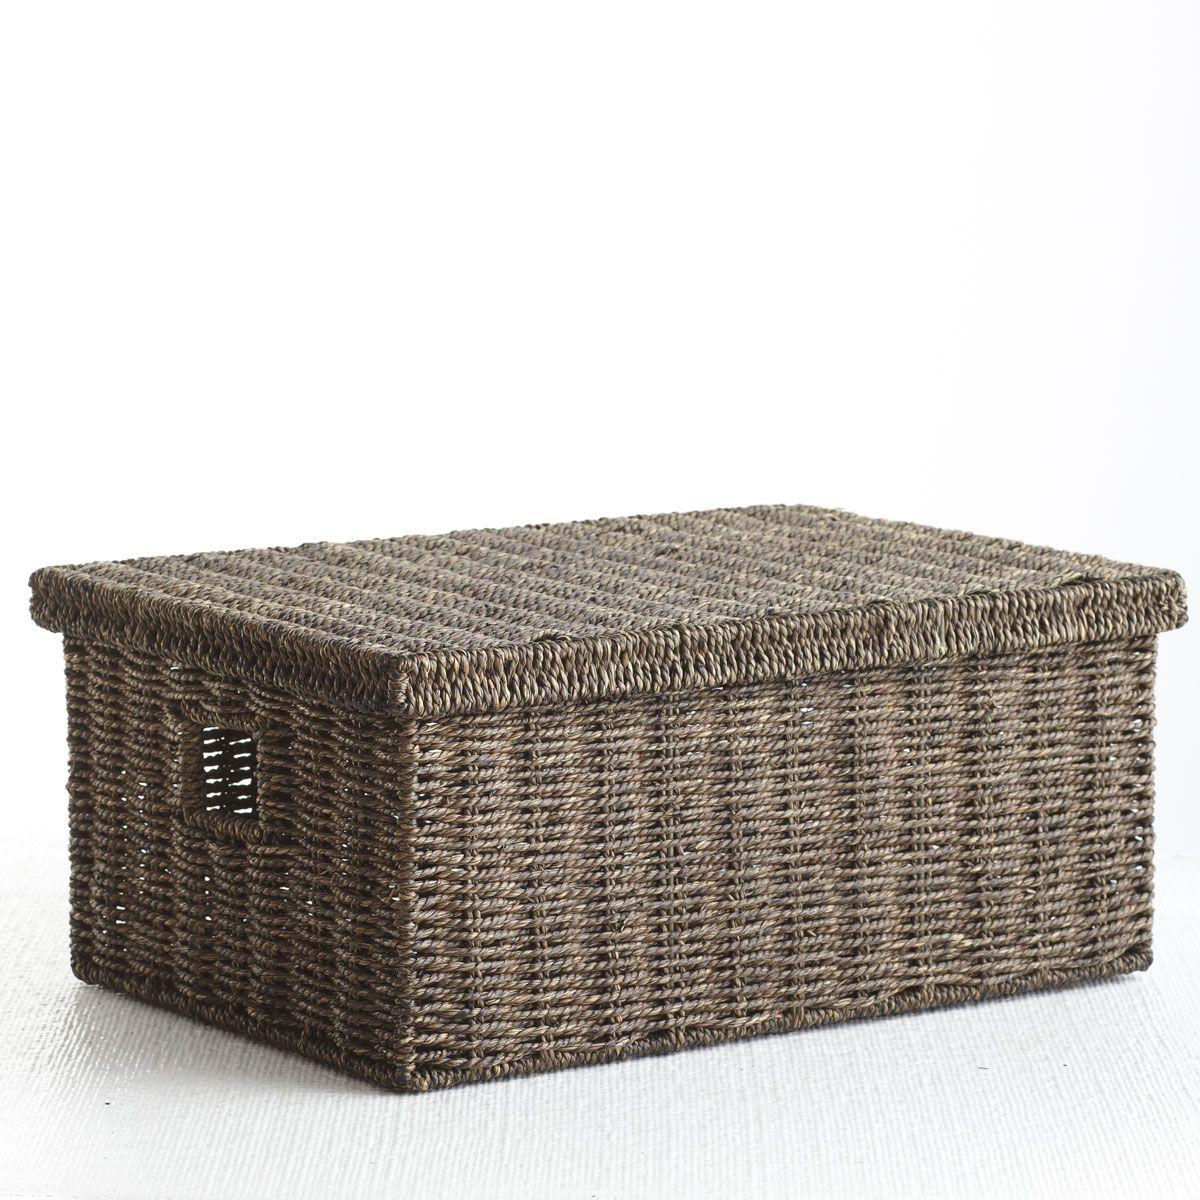 W8763Handmade Seagrass Basket